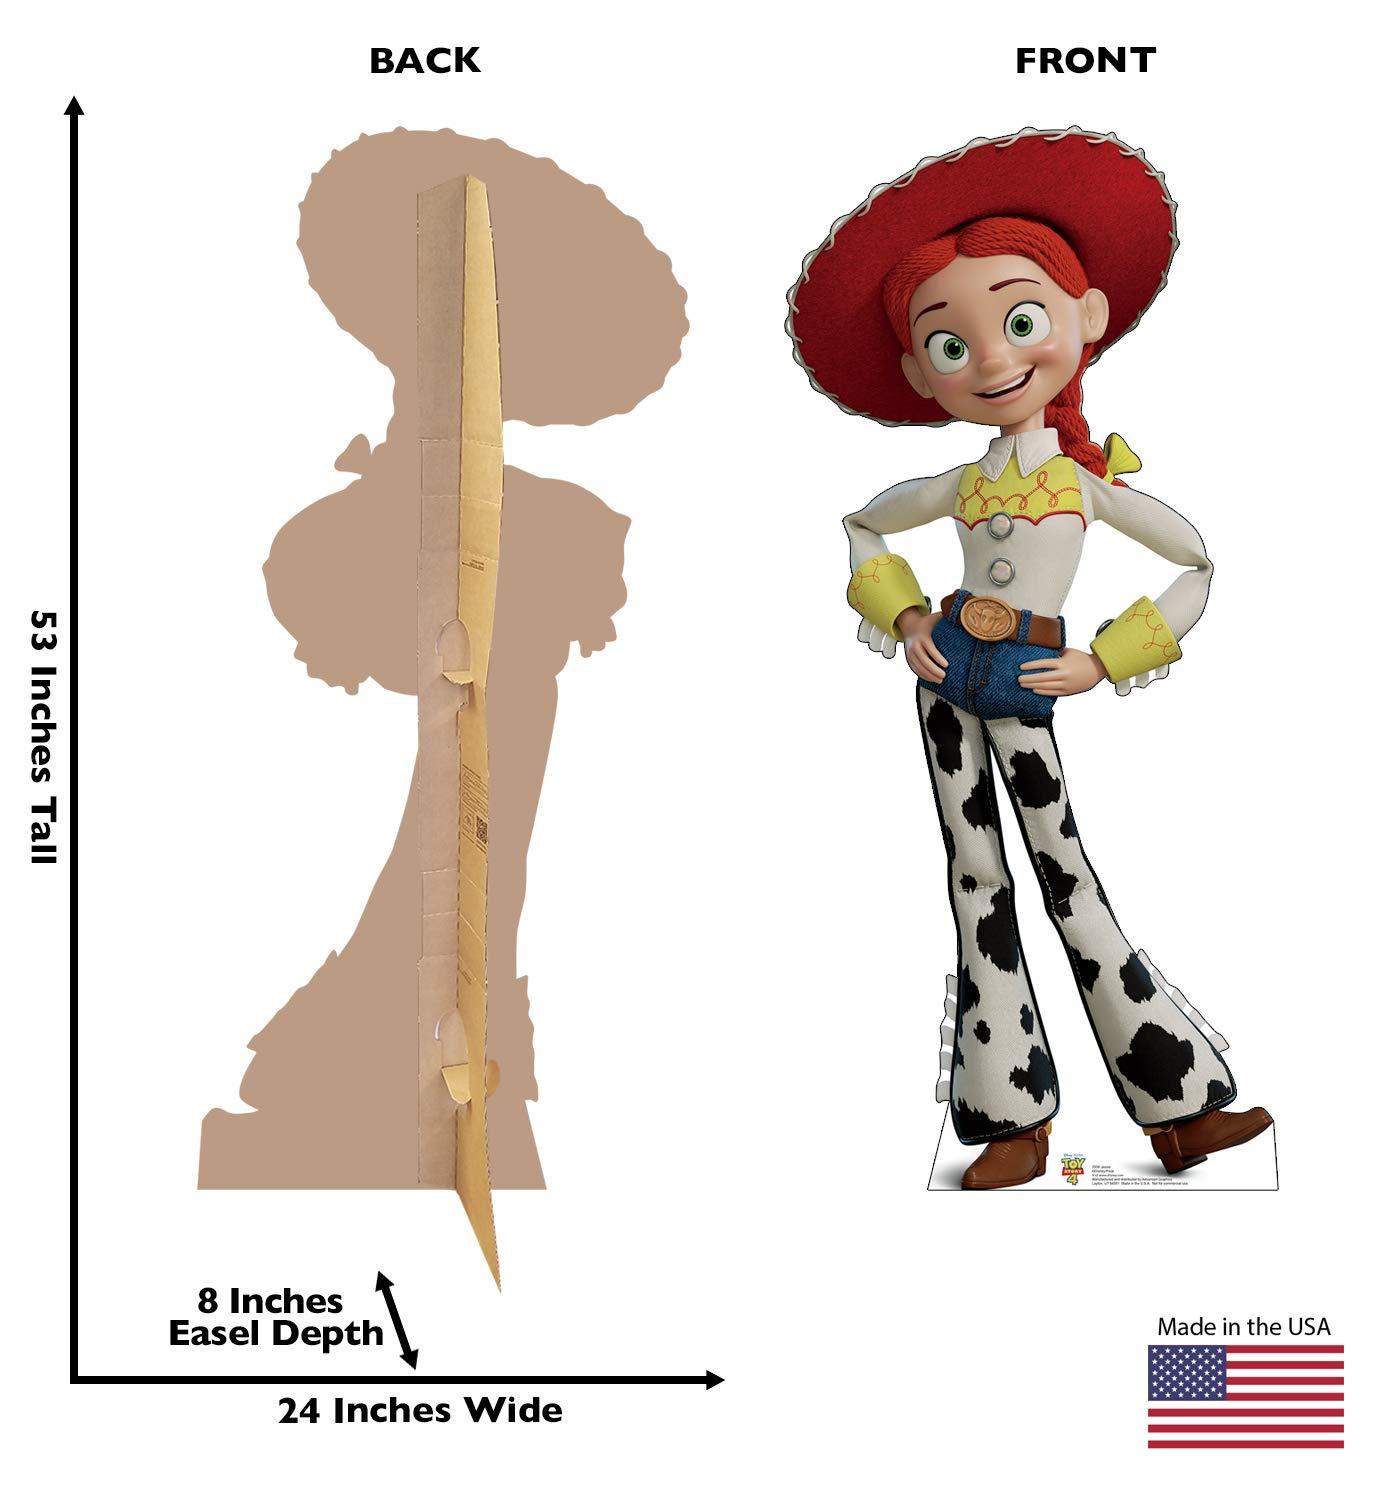 2019 Film Advanced Graphics Aliens Life Size Cardboard Cutout Standup Disney Pixar Toy Story 4